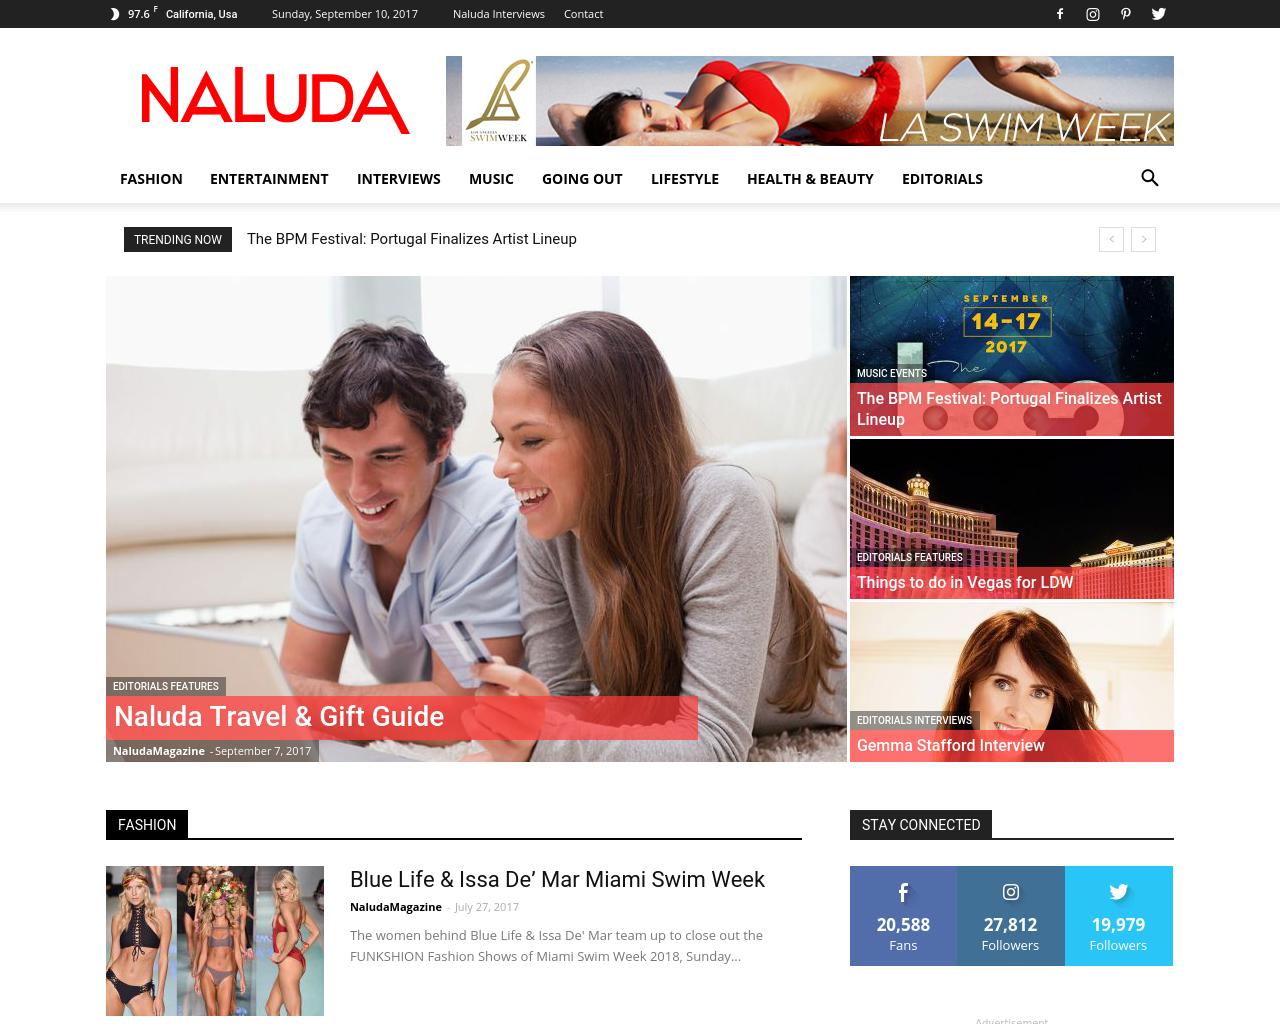 Naluda-Magazine-Advertising-Reviews-Pricing